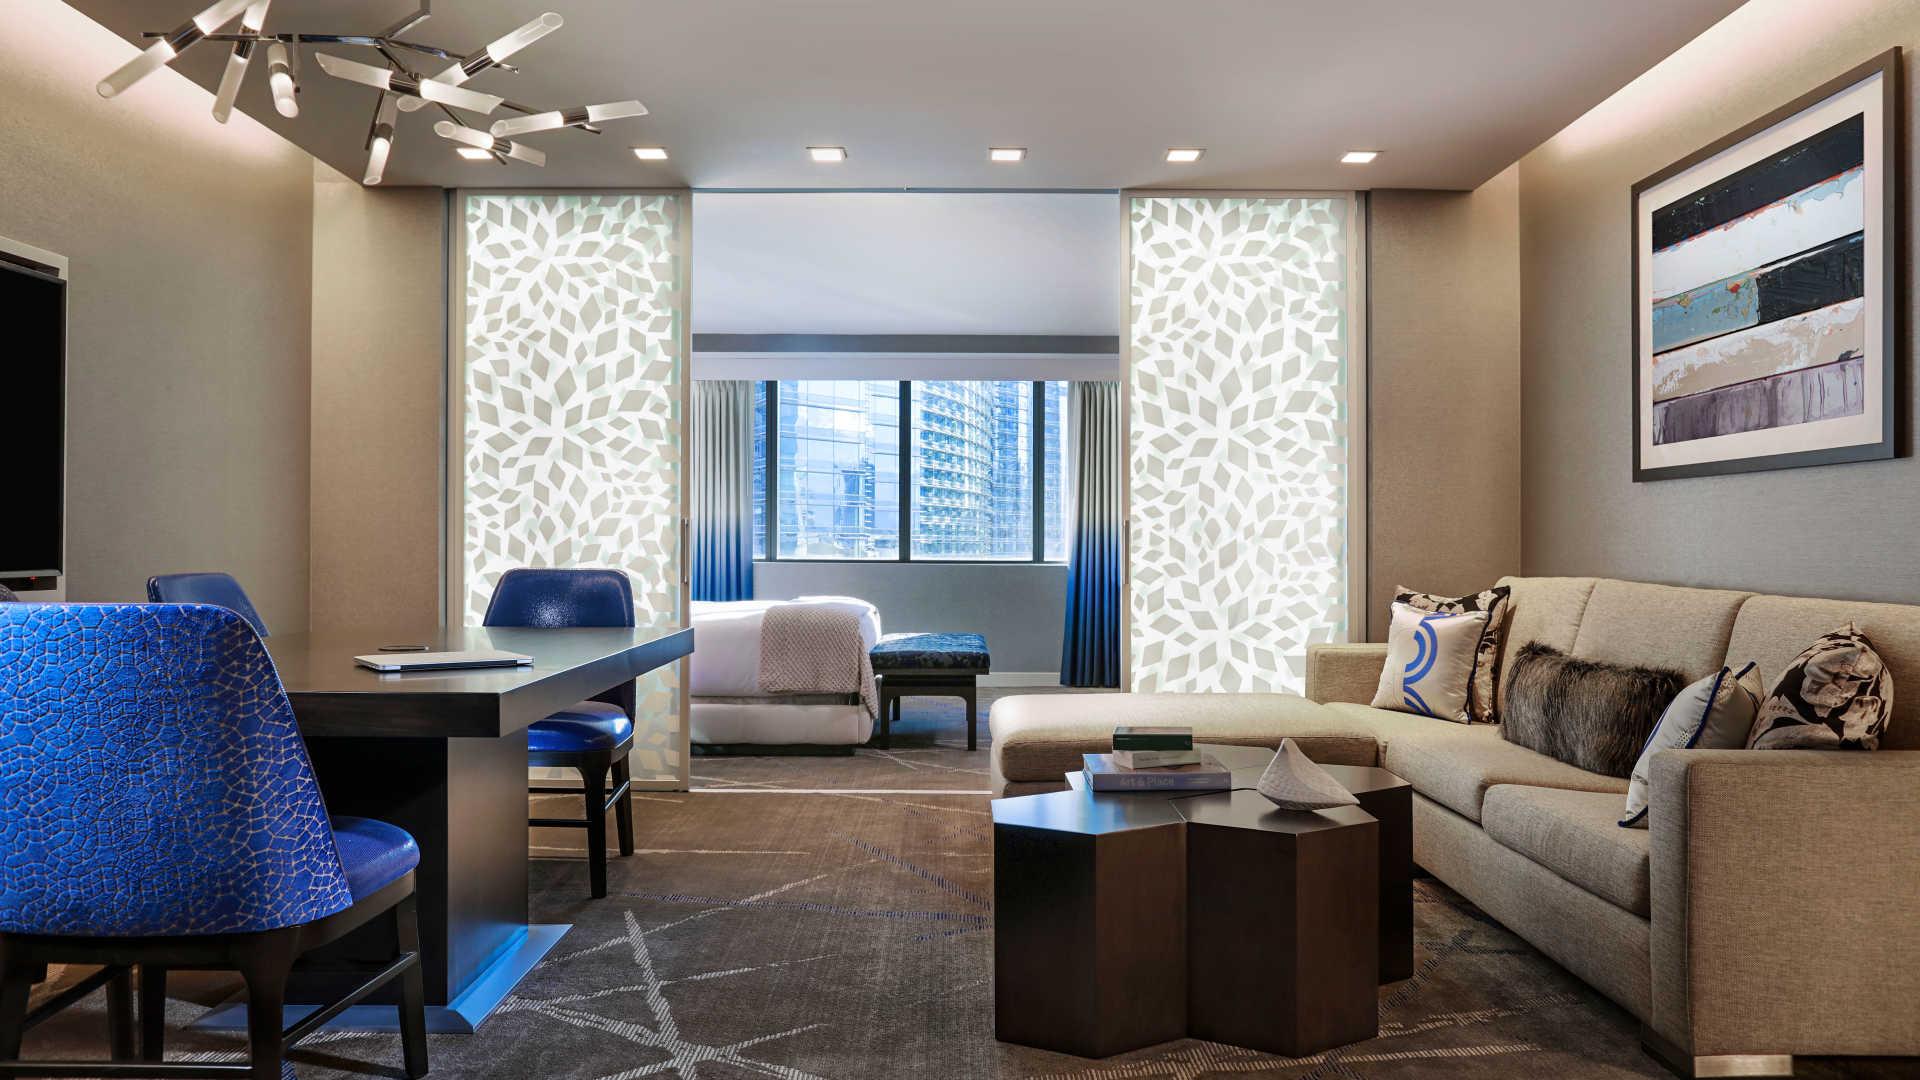 Groovy Las Vegas Luxury Hotel Rooms And Suites The Cosmopolitan Download Free Architecture Designs Scobabritishbridgeorg